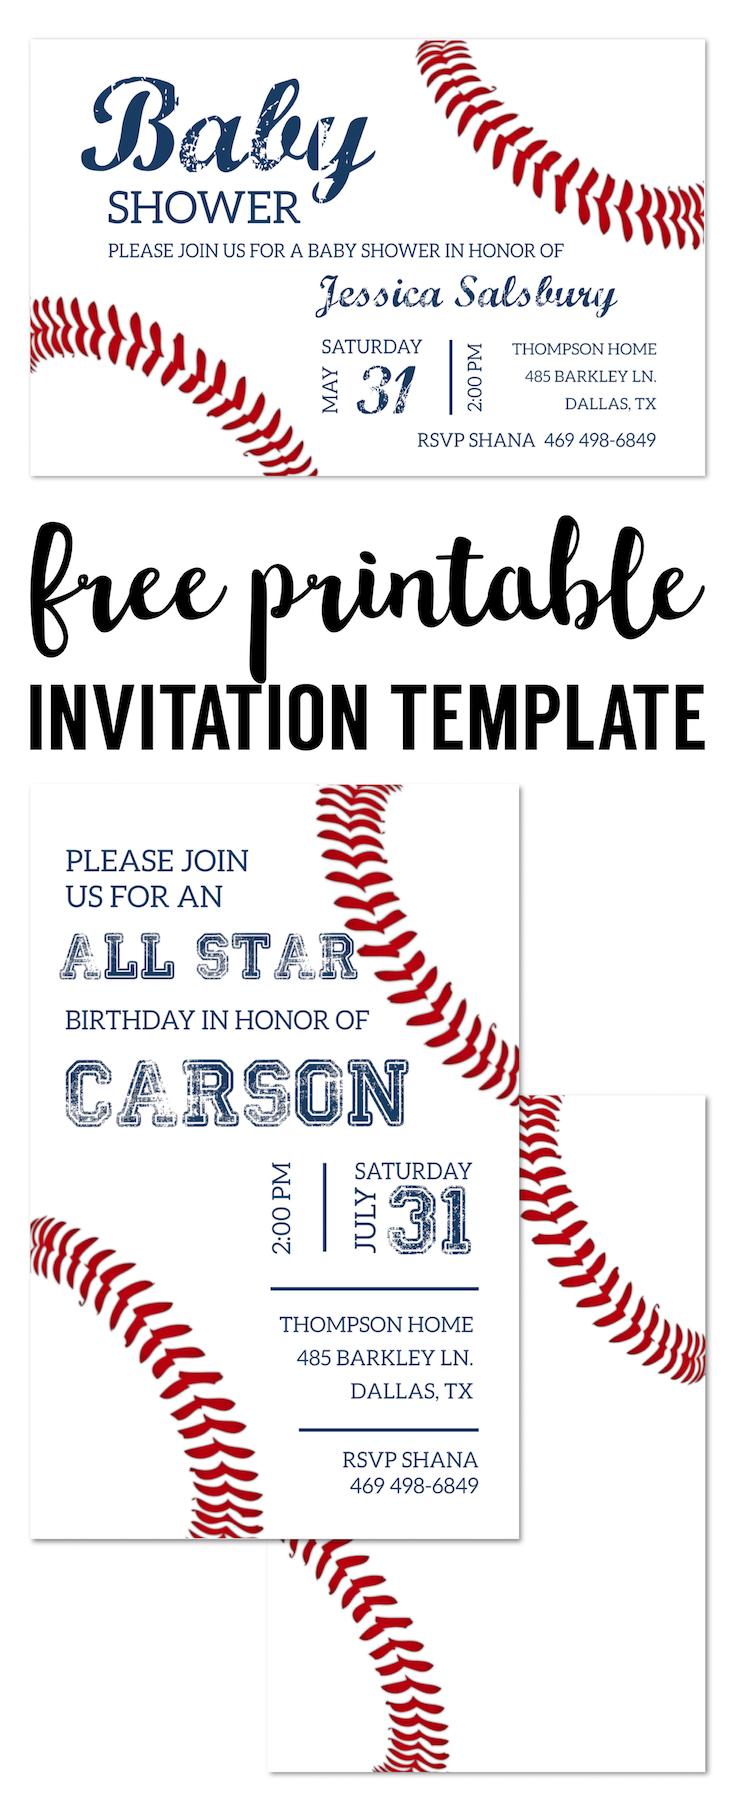 Baseball invitation template long paper trail design baseball party invitations free printable baseball invitation template for a diy baseball birthday party stopboris Choice Image